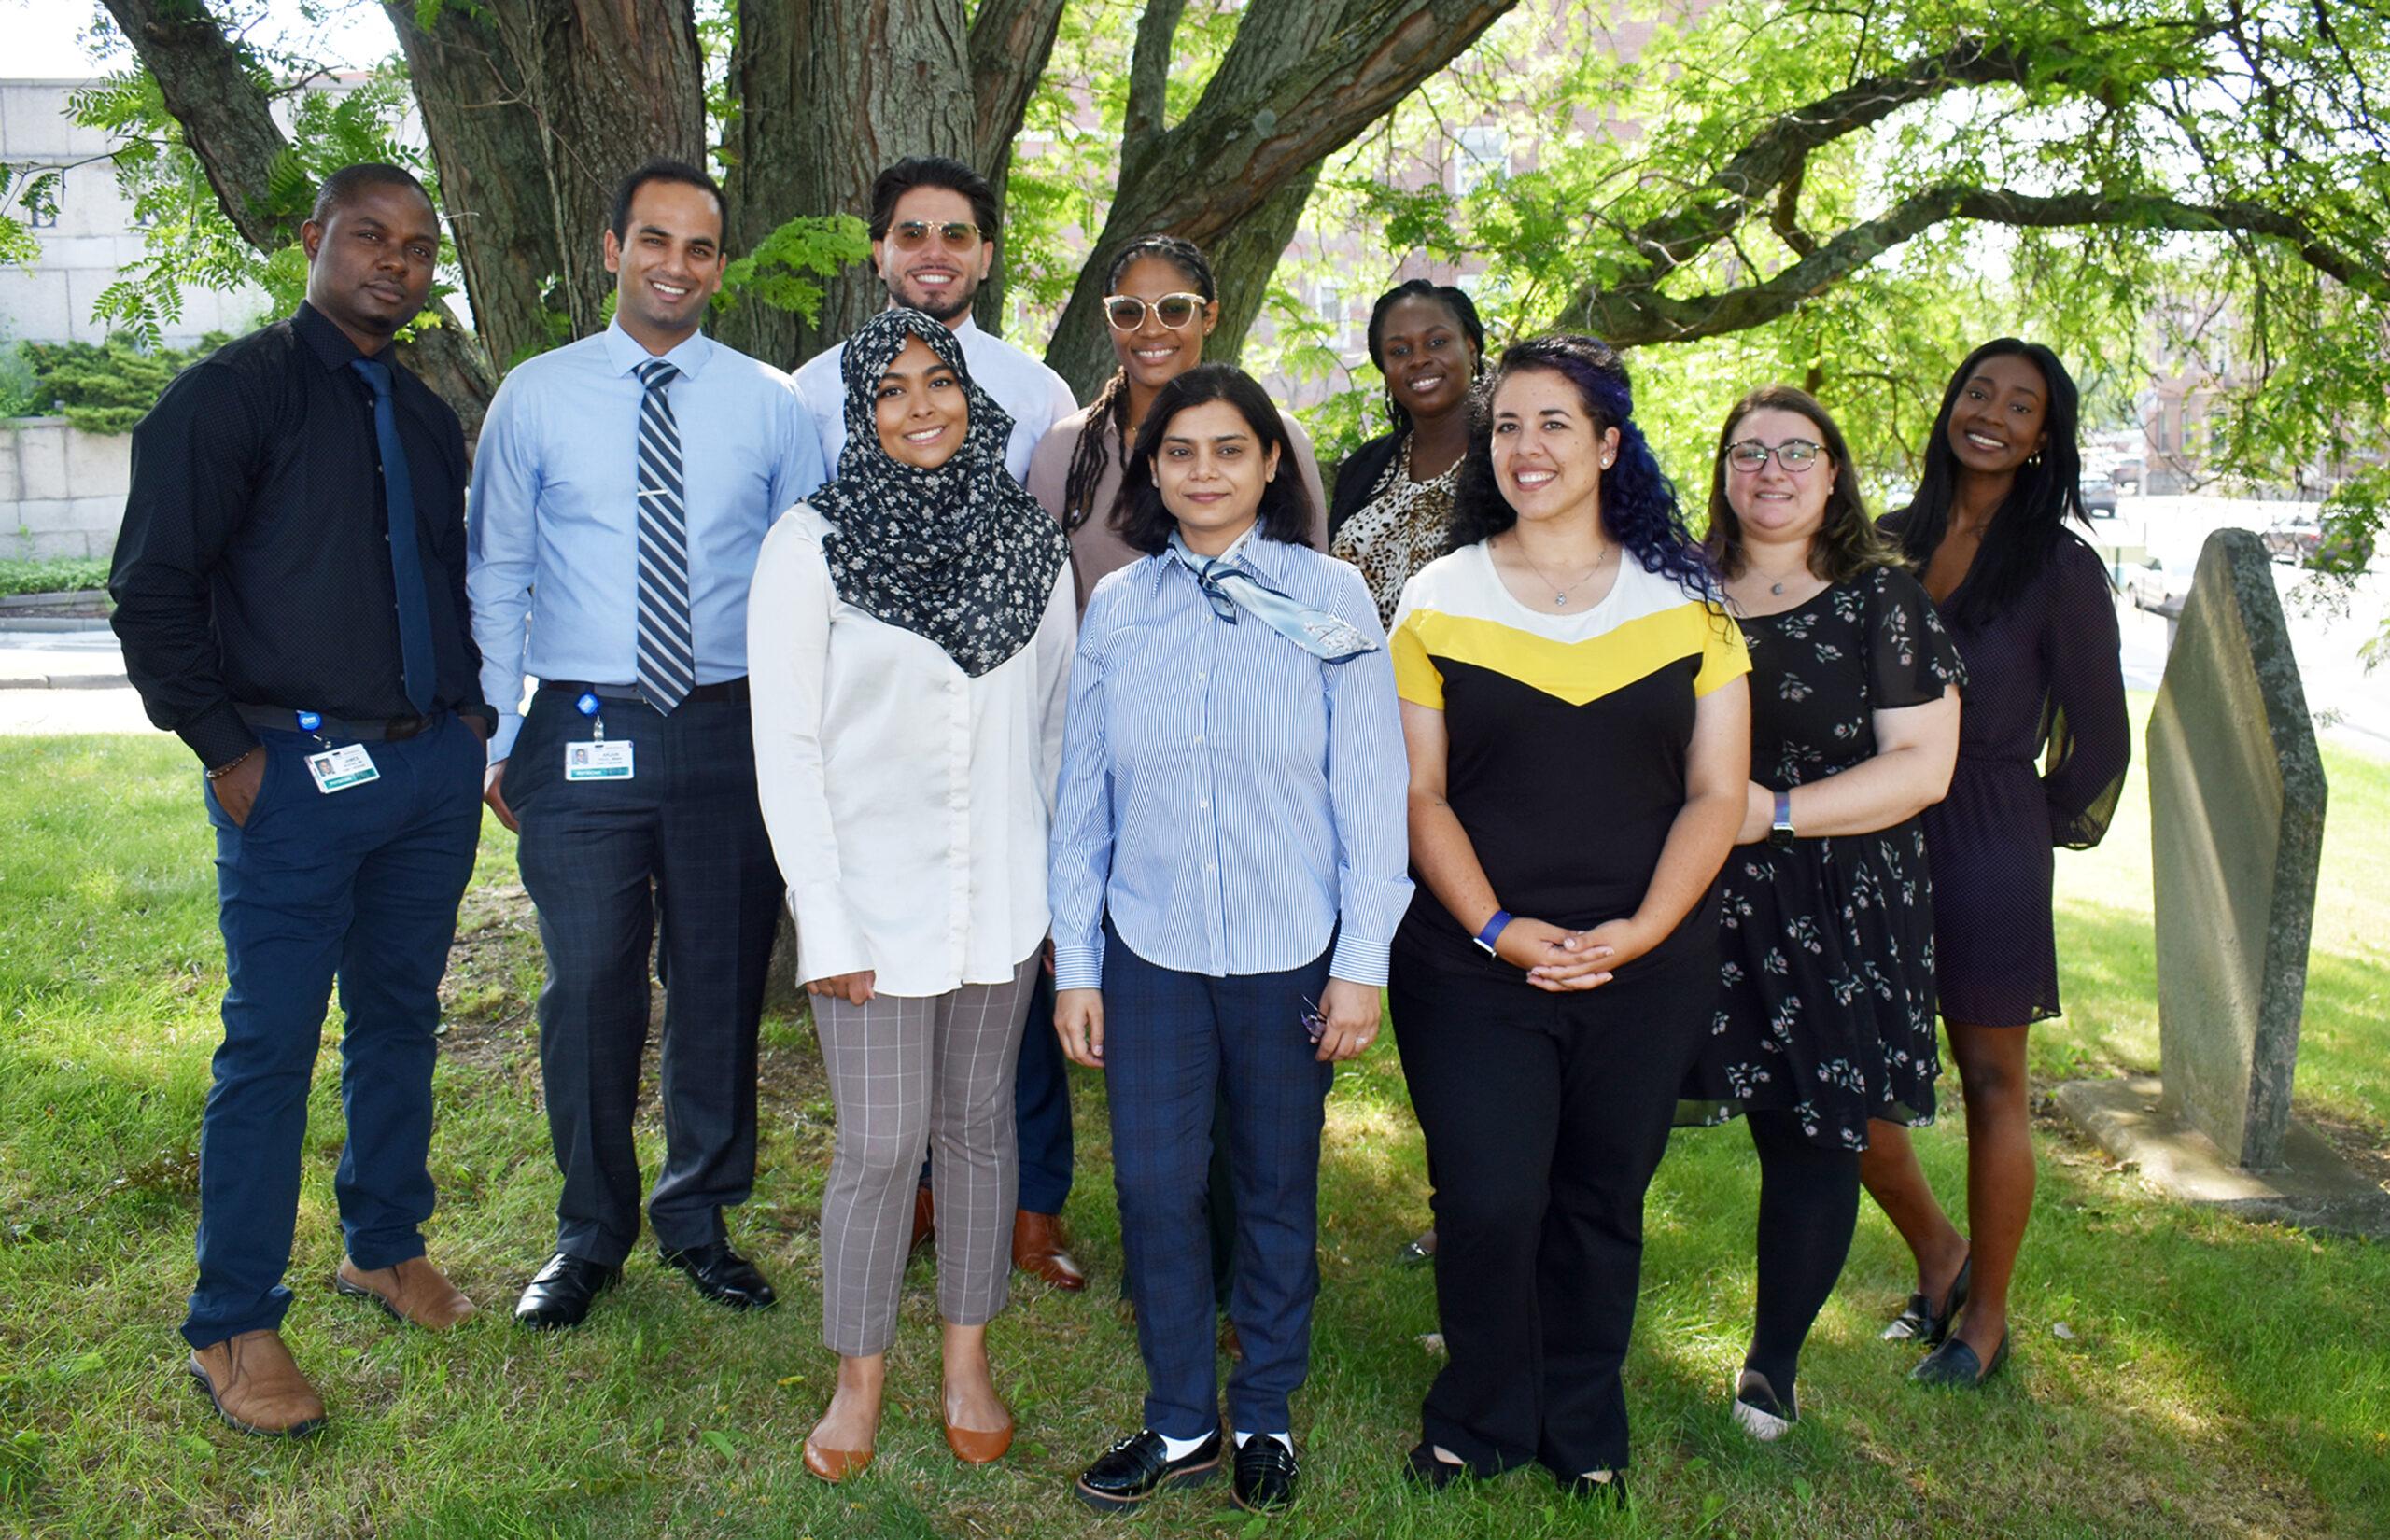 (English) Mid-Hudson Family Medicine Residency Program Image